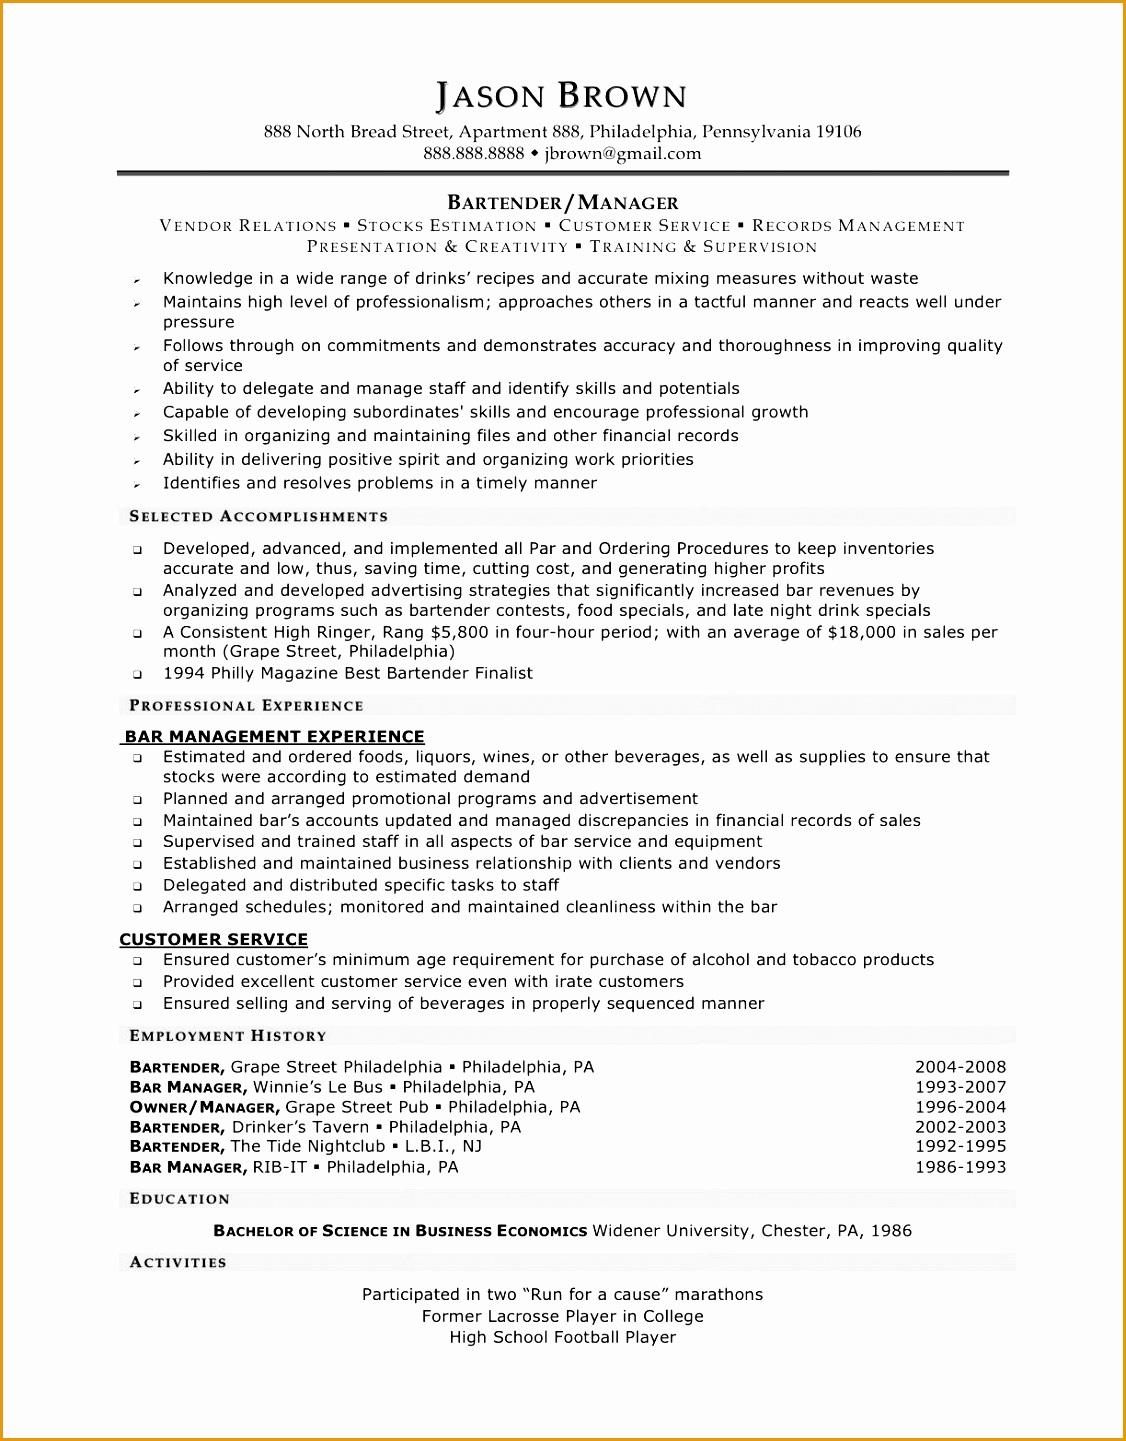 bartender resume skills template14411126